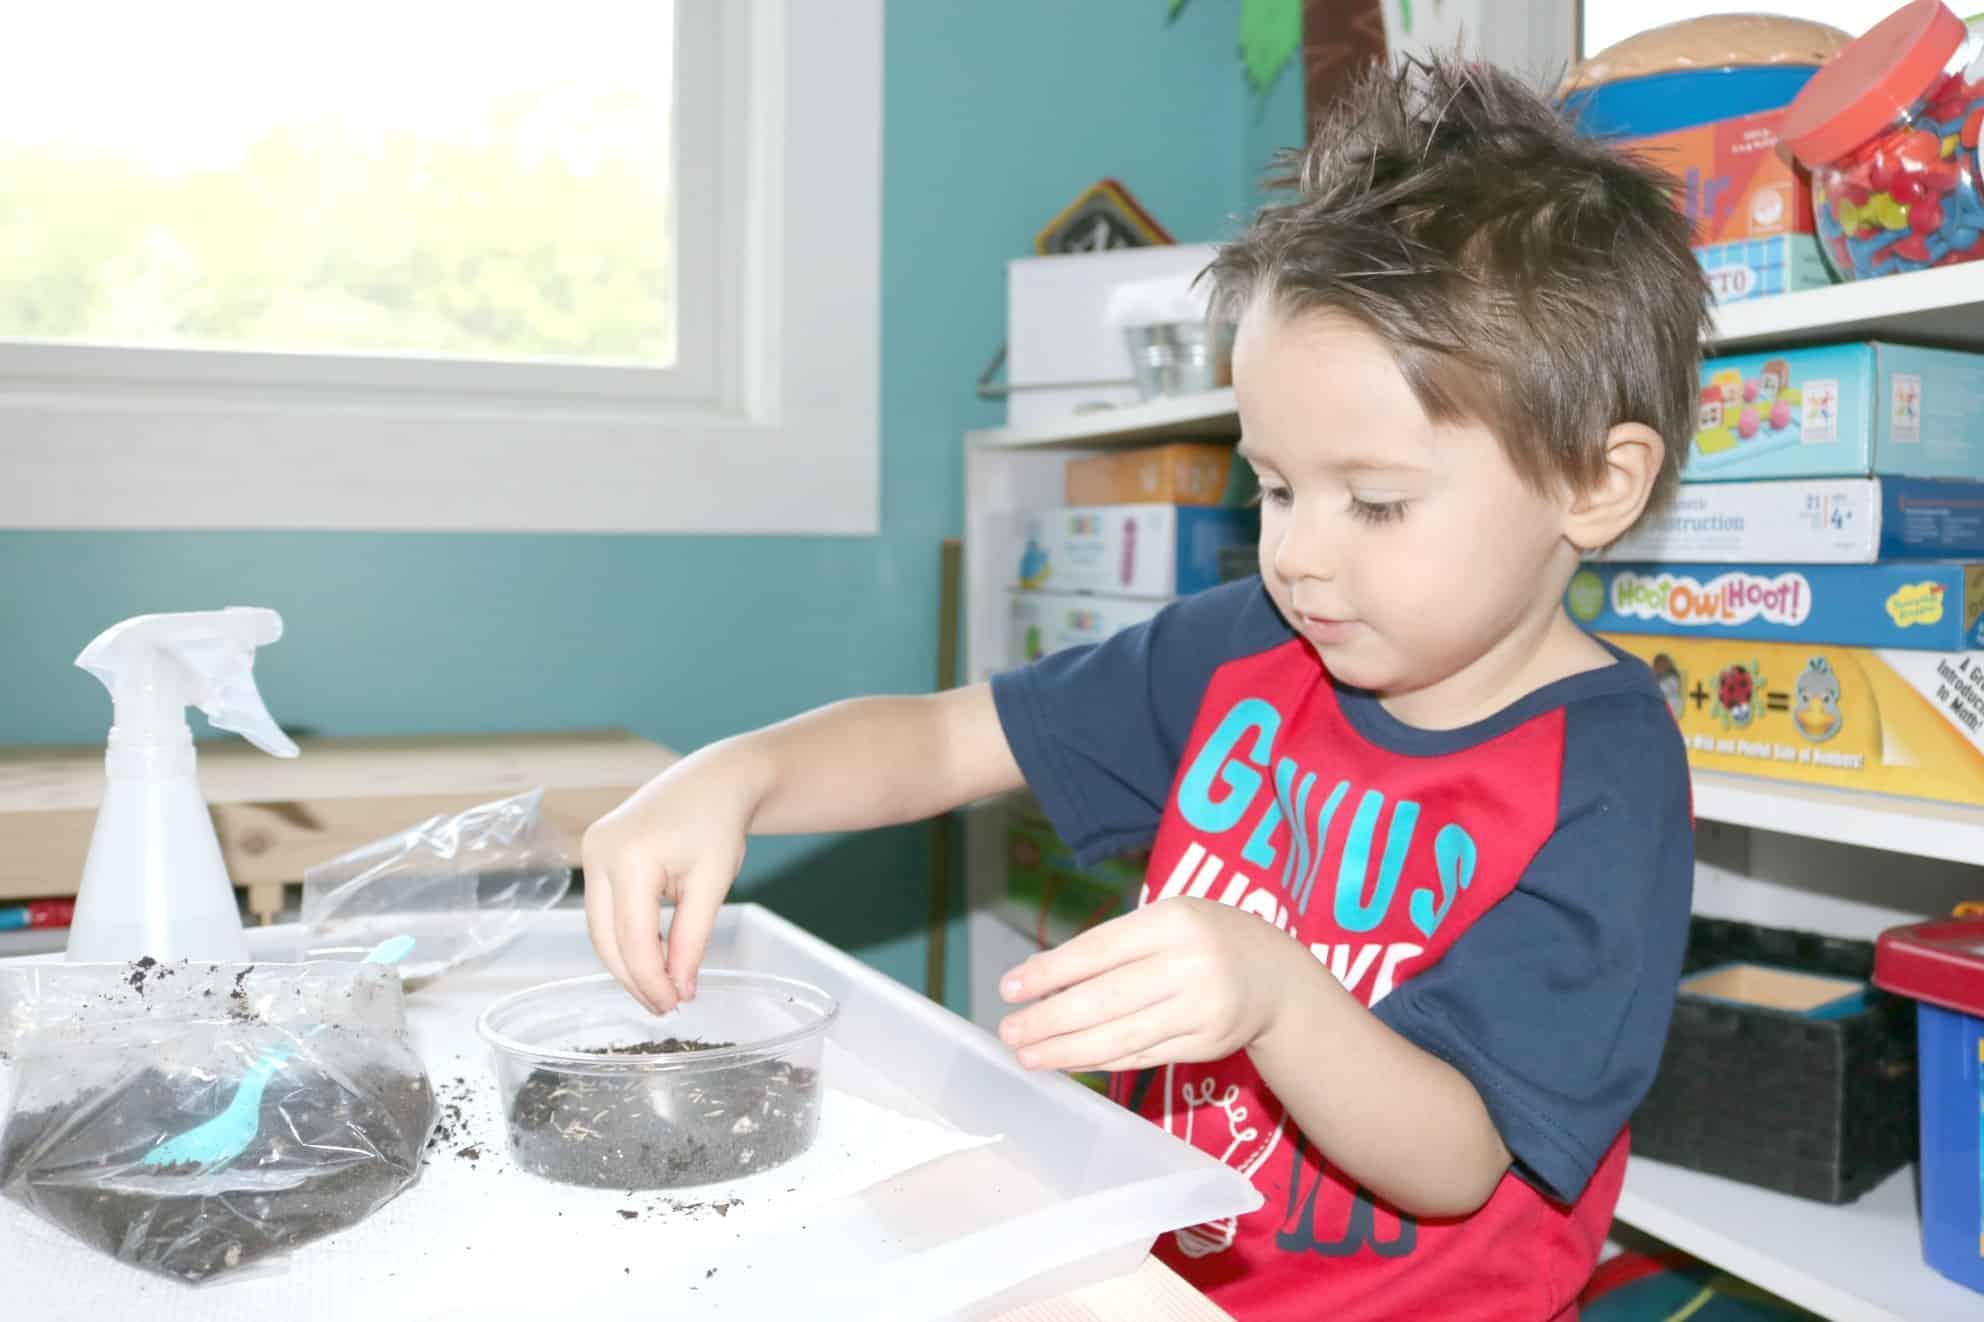 Growing Grass Make & Play Gardening Activity for Preschoolers